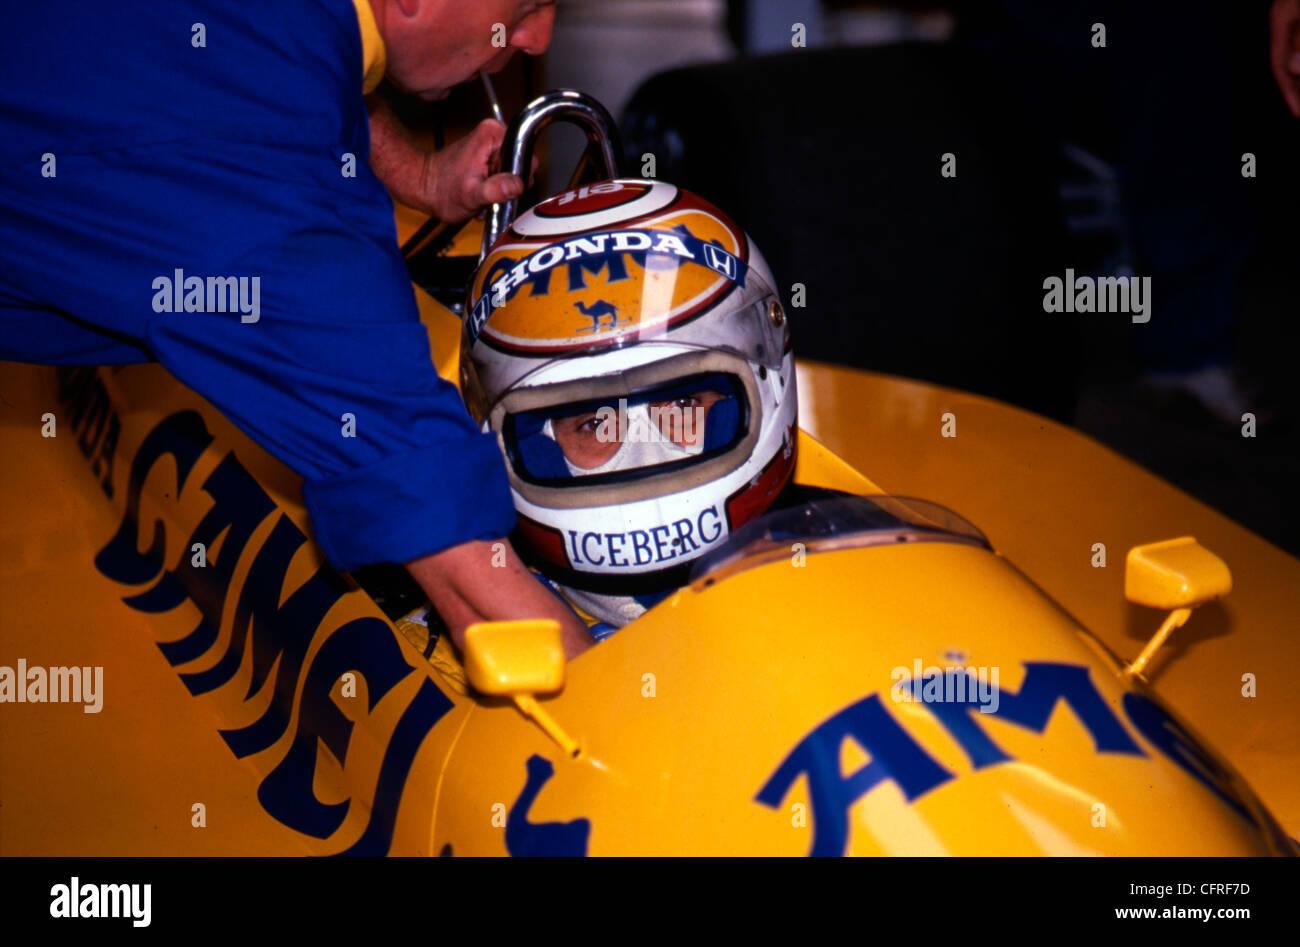 Nelson Piquet  in Camel Lotus Honda 100T at British Grand Prix Silverstone , July 1988 - Stock Image